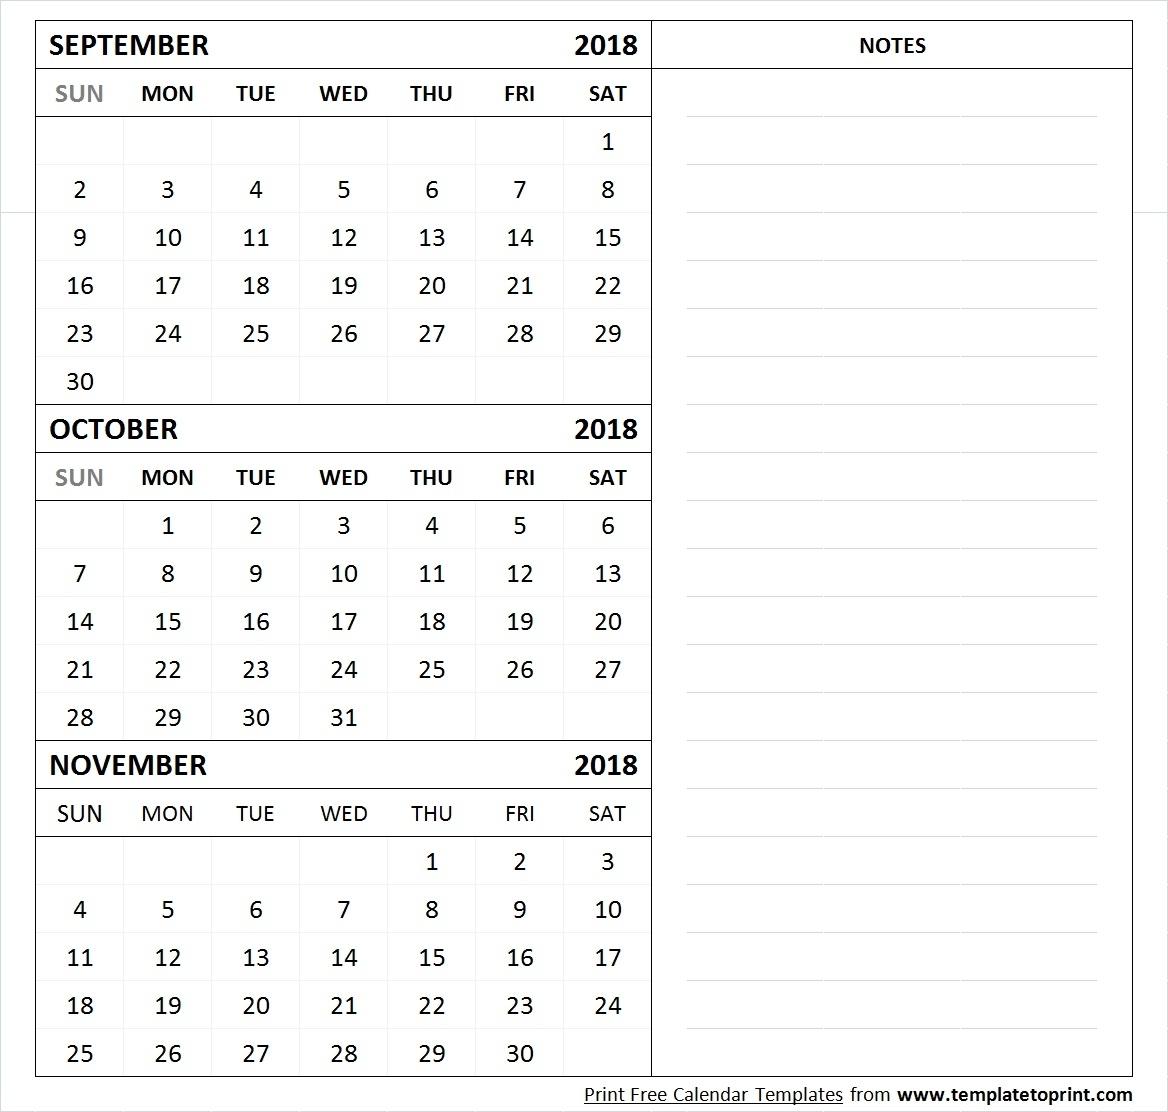 September October November 2018 Calendar Template 3 Month Calendar regarding 3 Month Calendar Printable With Notes September October November